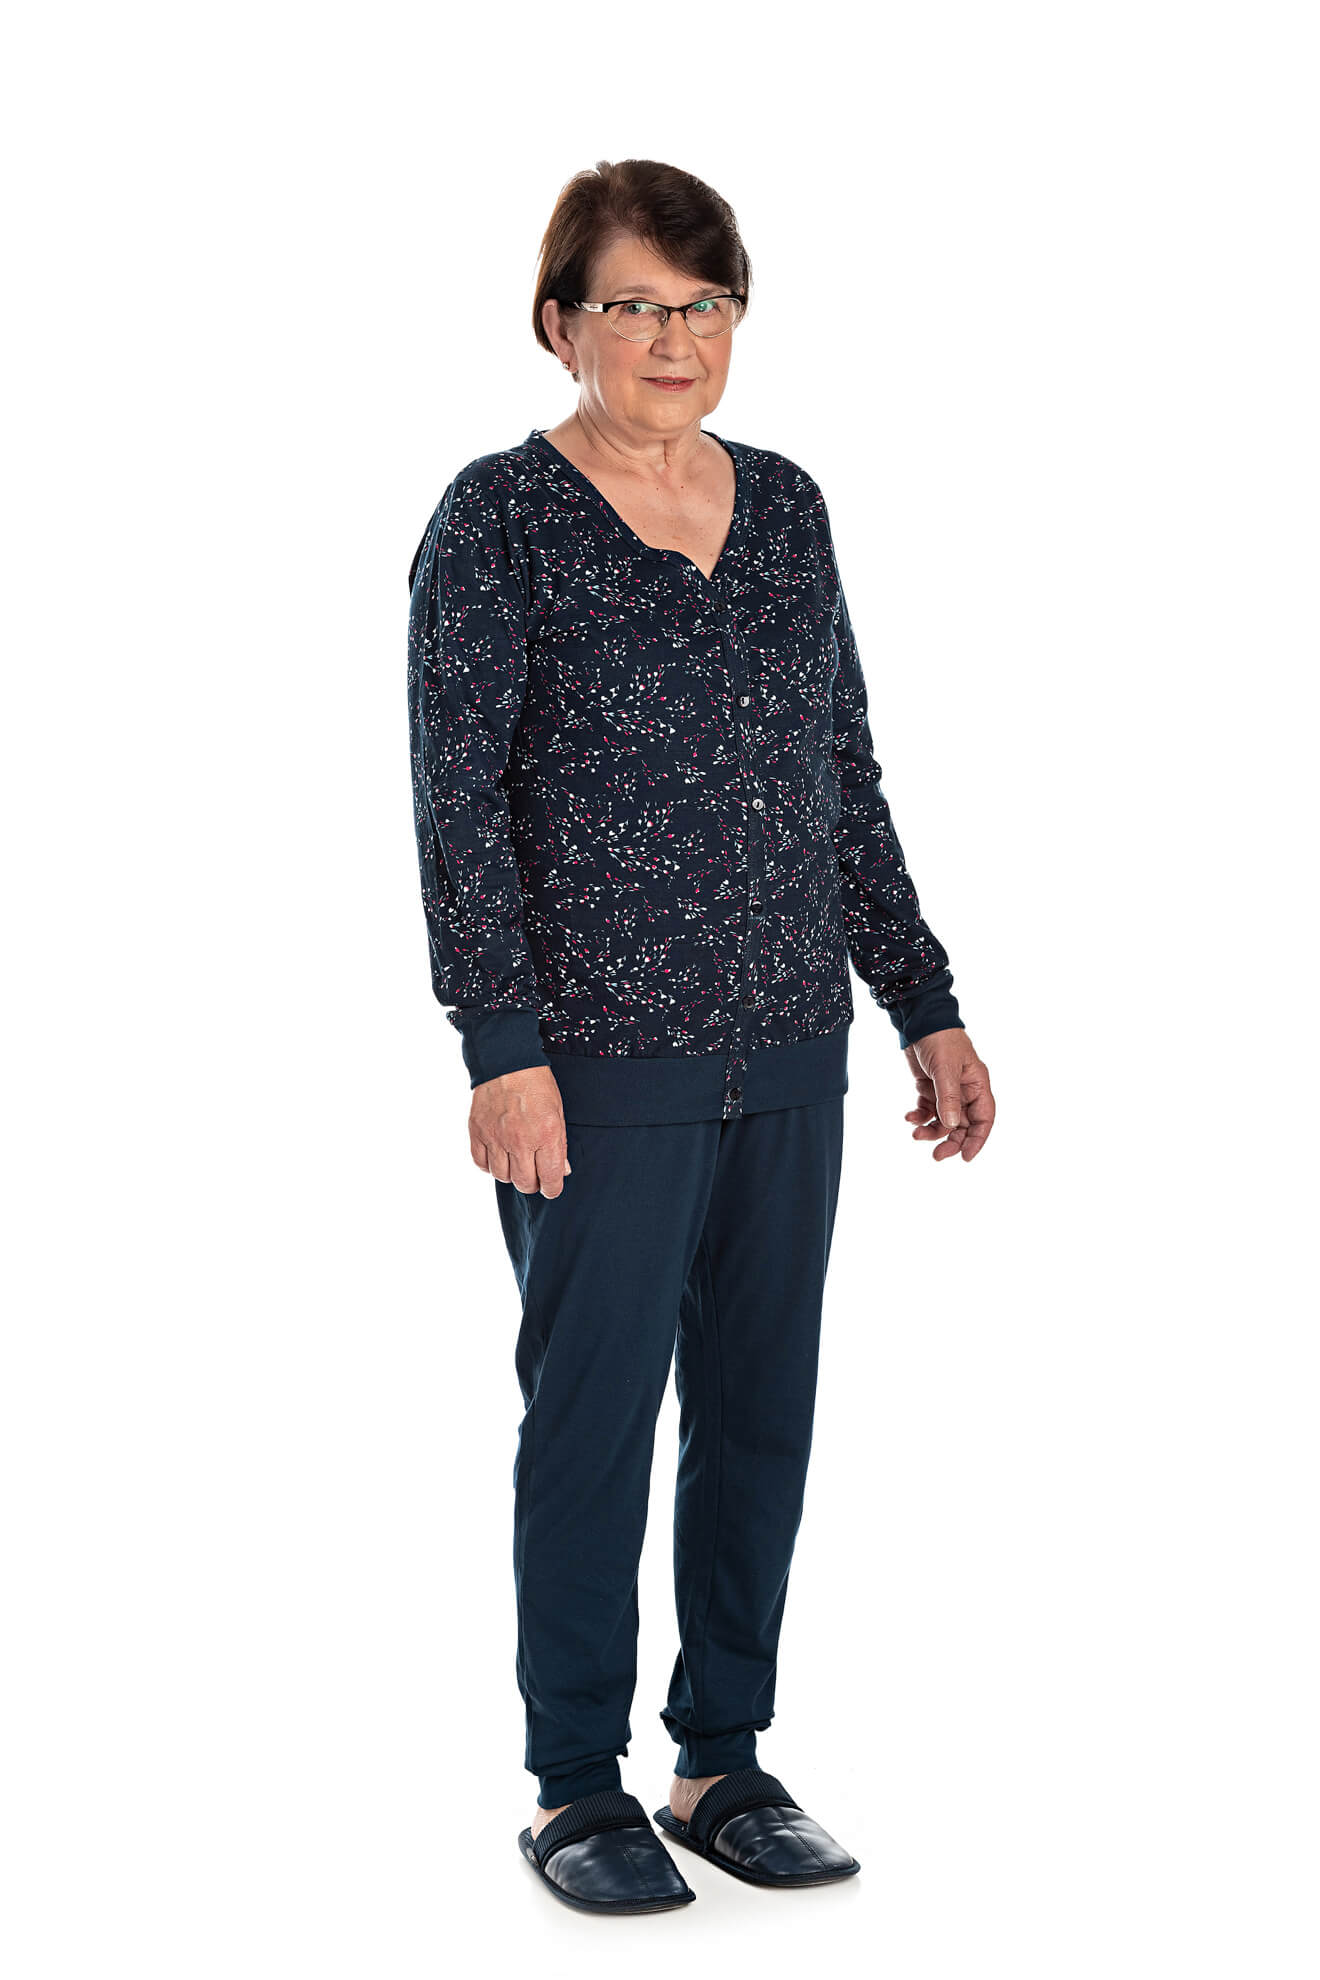 010/B - Pijama Adulto Feminino Estampa Rotativa